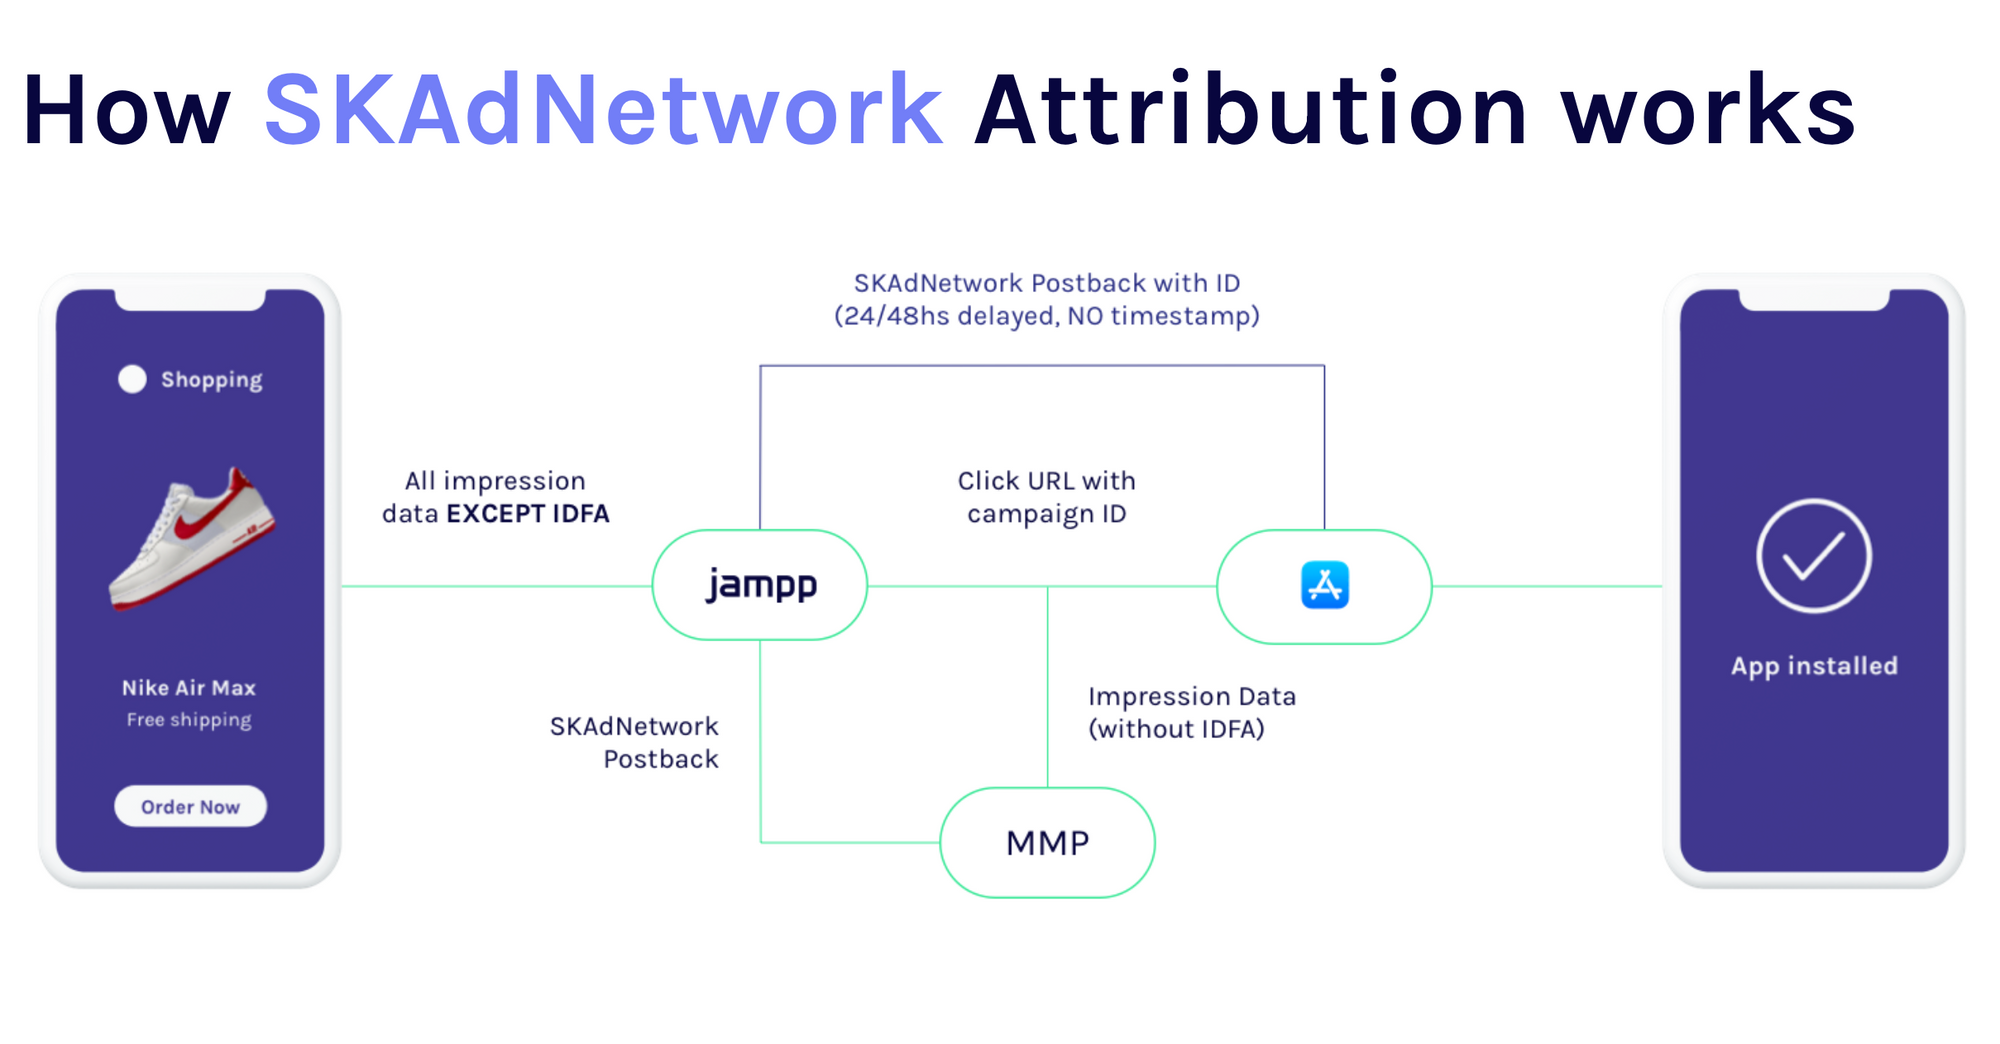 How SKAdNetwork attribution works